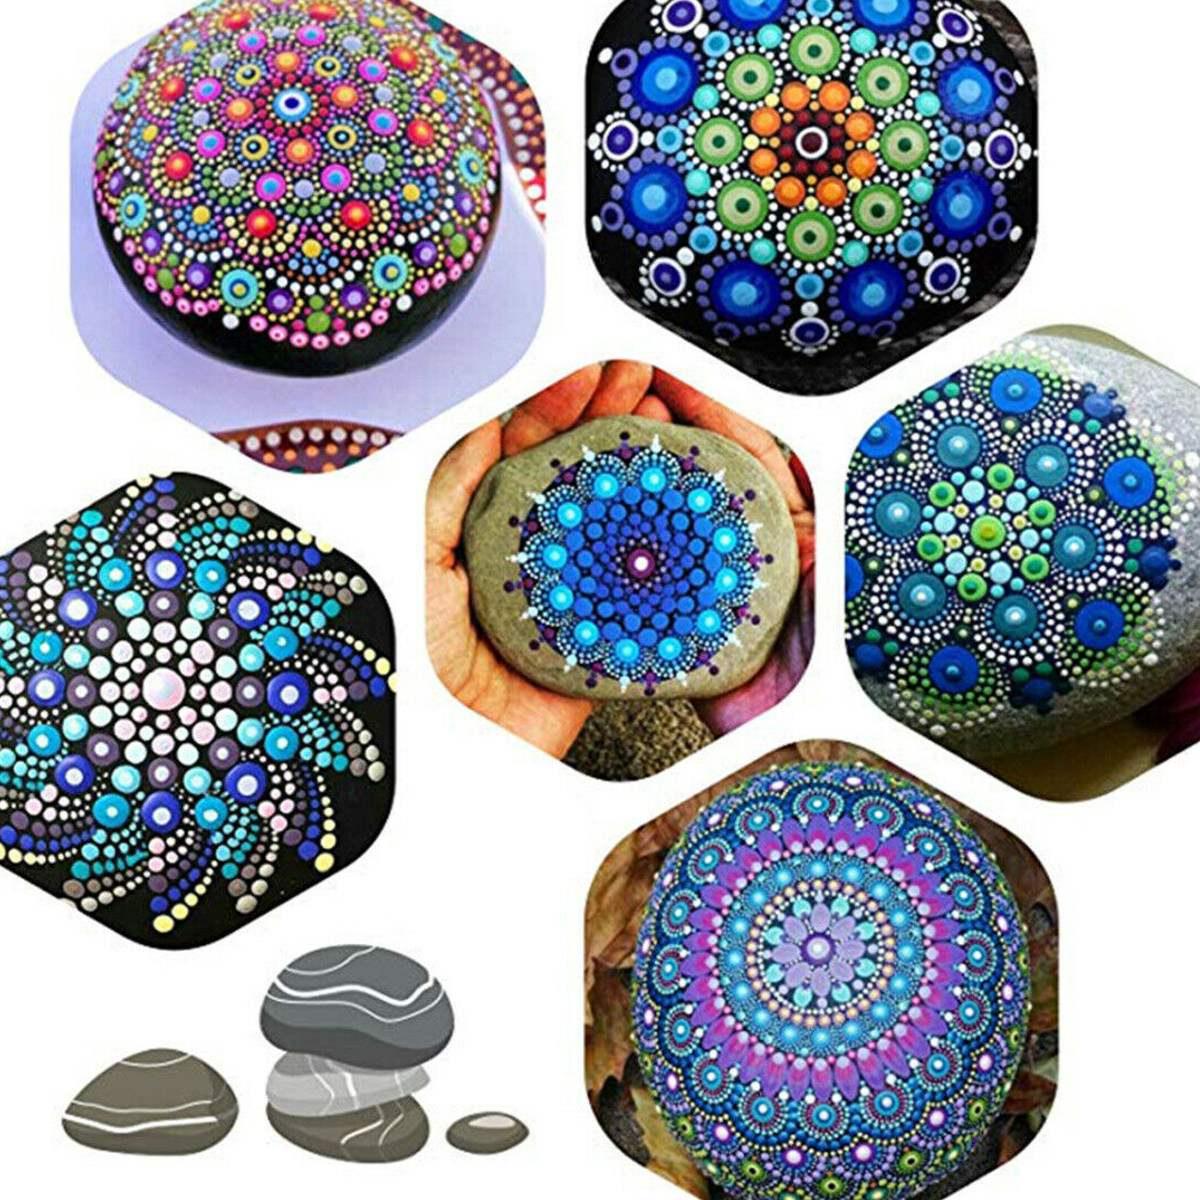 12Pcs/set Craft Mandala Auxiliary Template Stone Painting Stencils DIY Scrapbooking Album Paper Card Decorative Craft Embossing